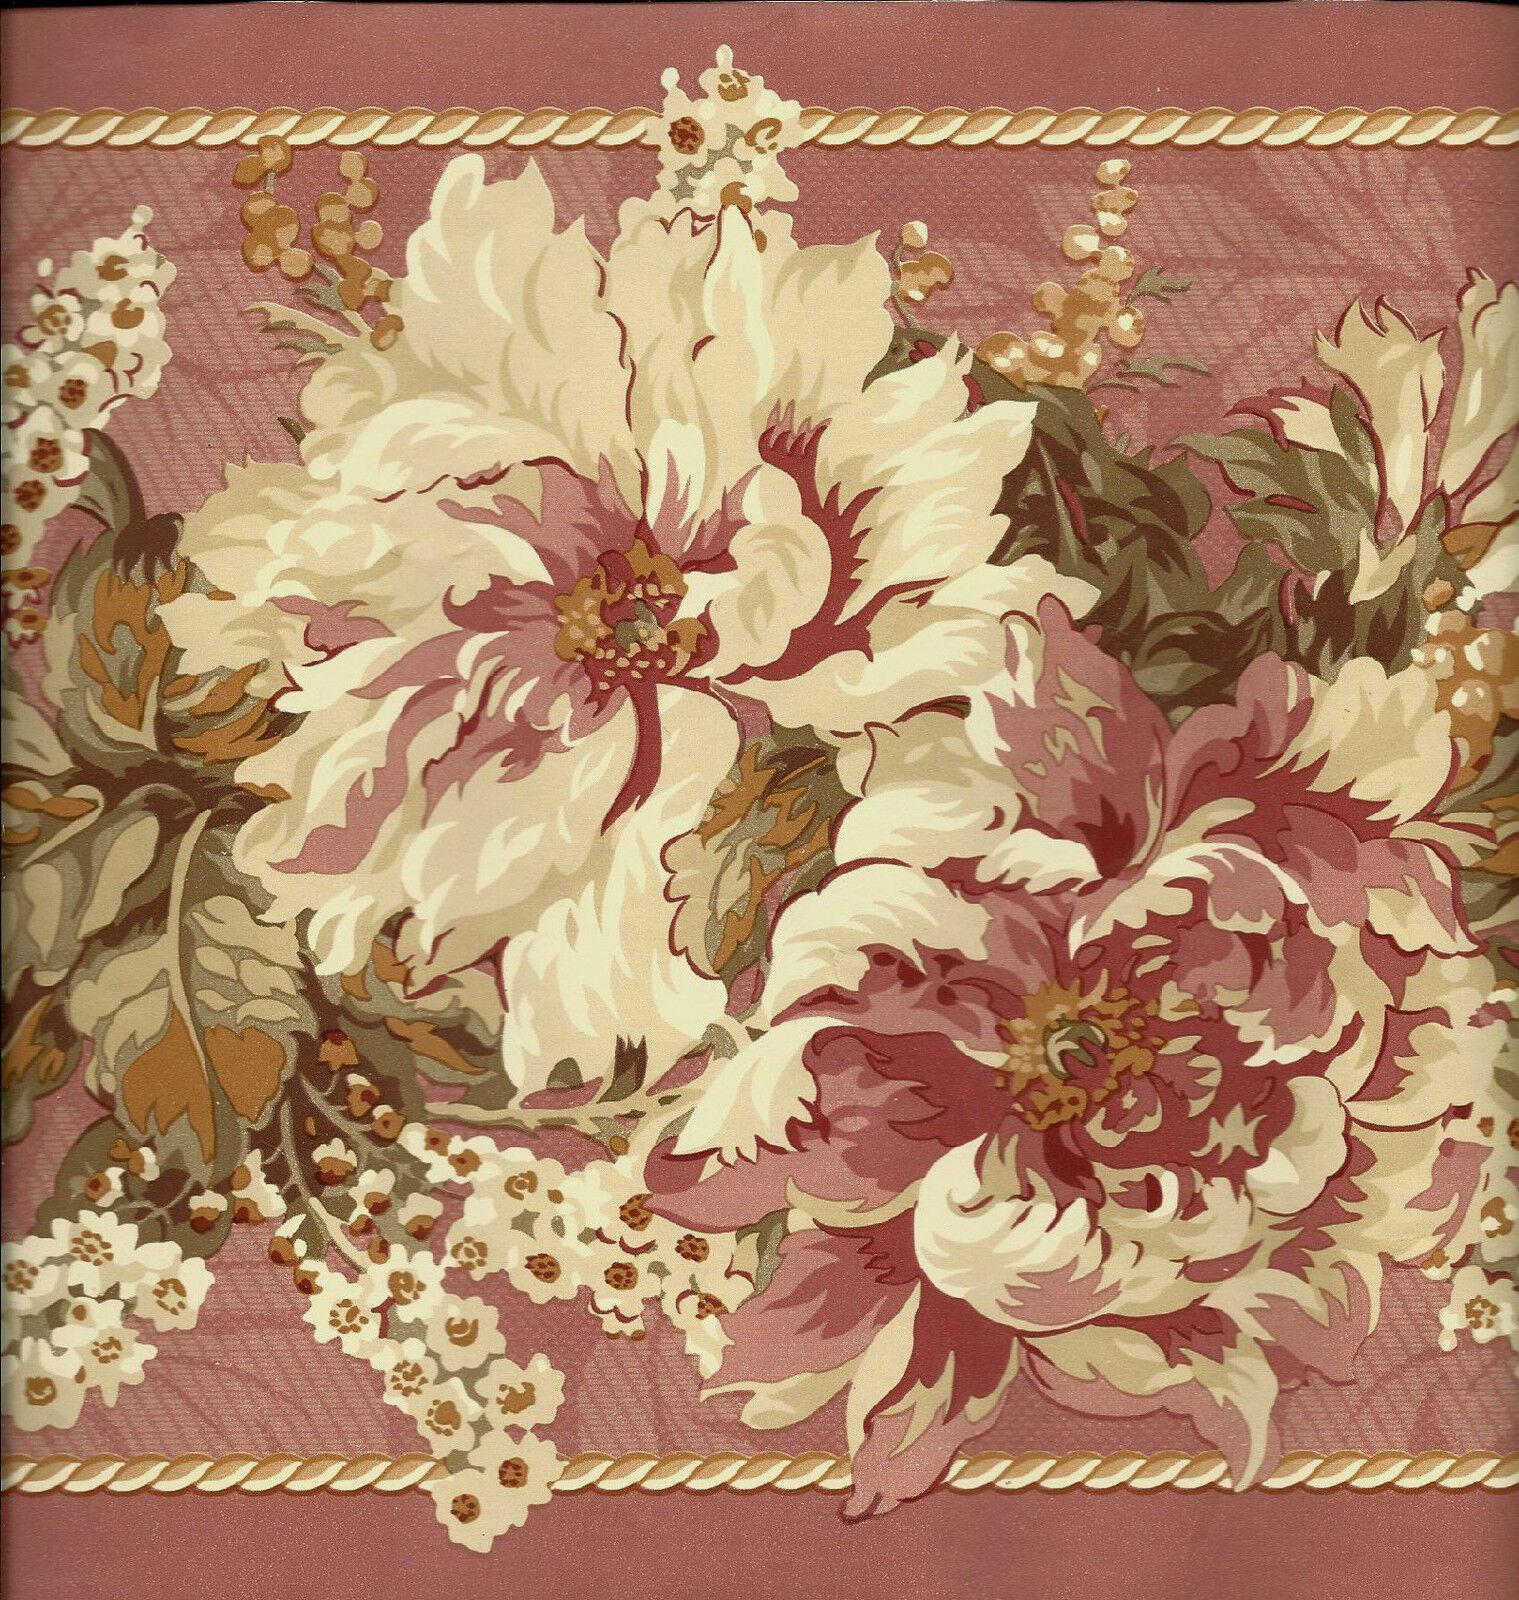 Victorian Dusty Rose Floral Wallpaper Border For Sale Online